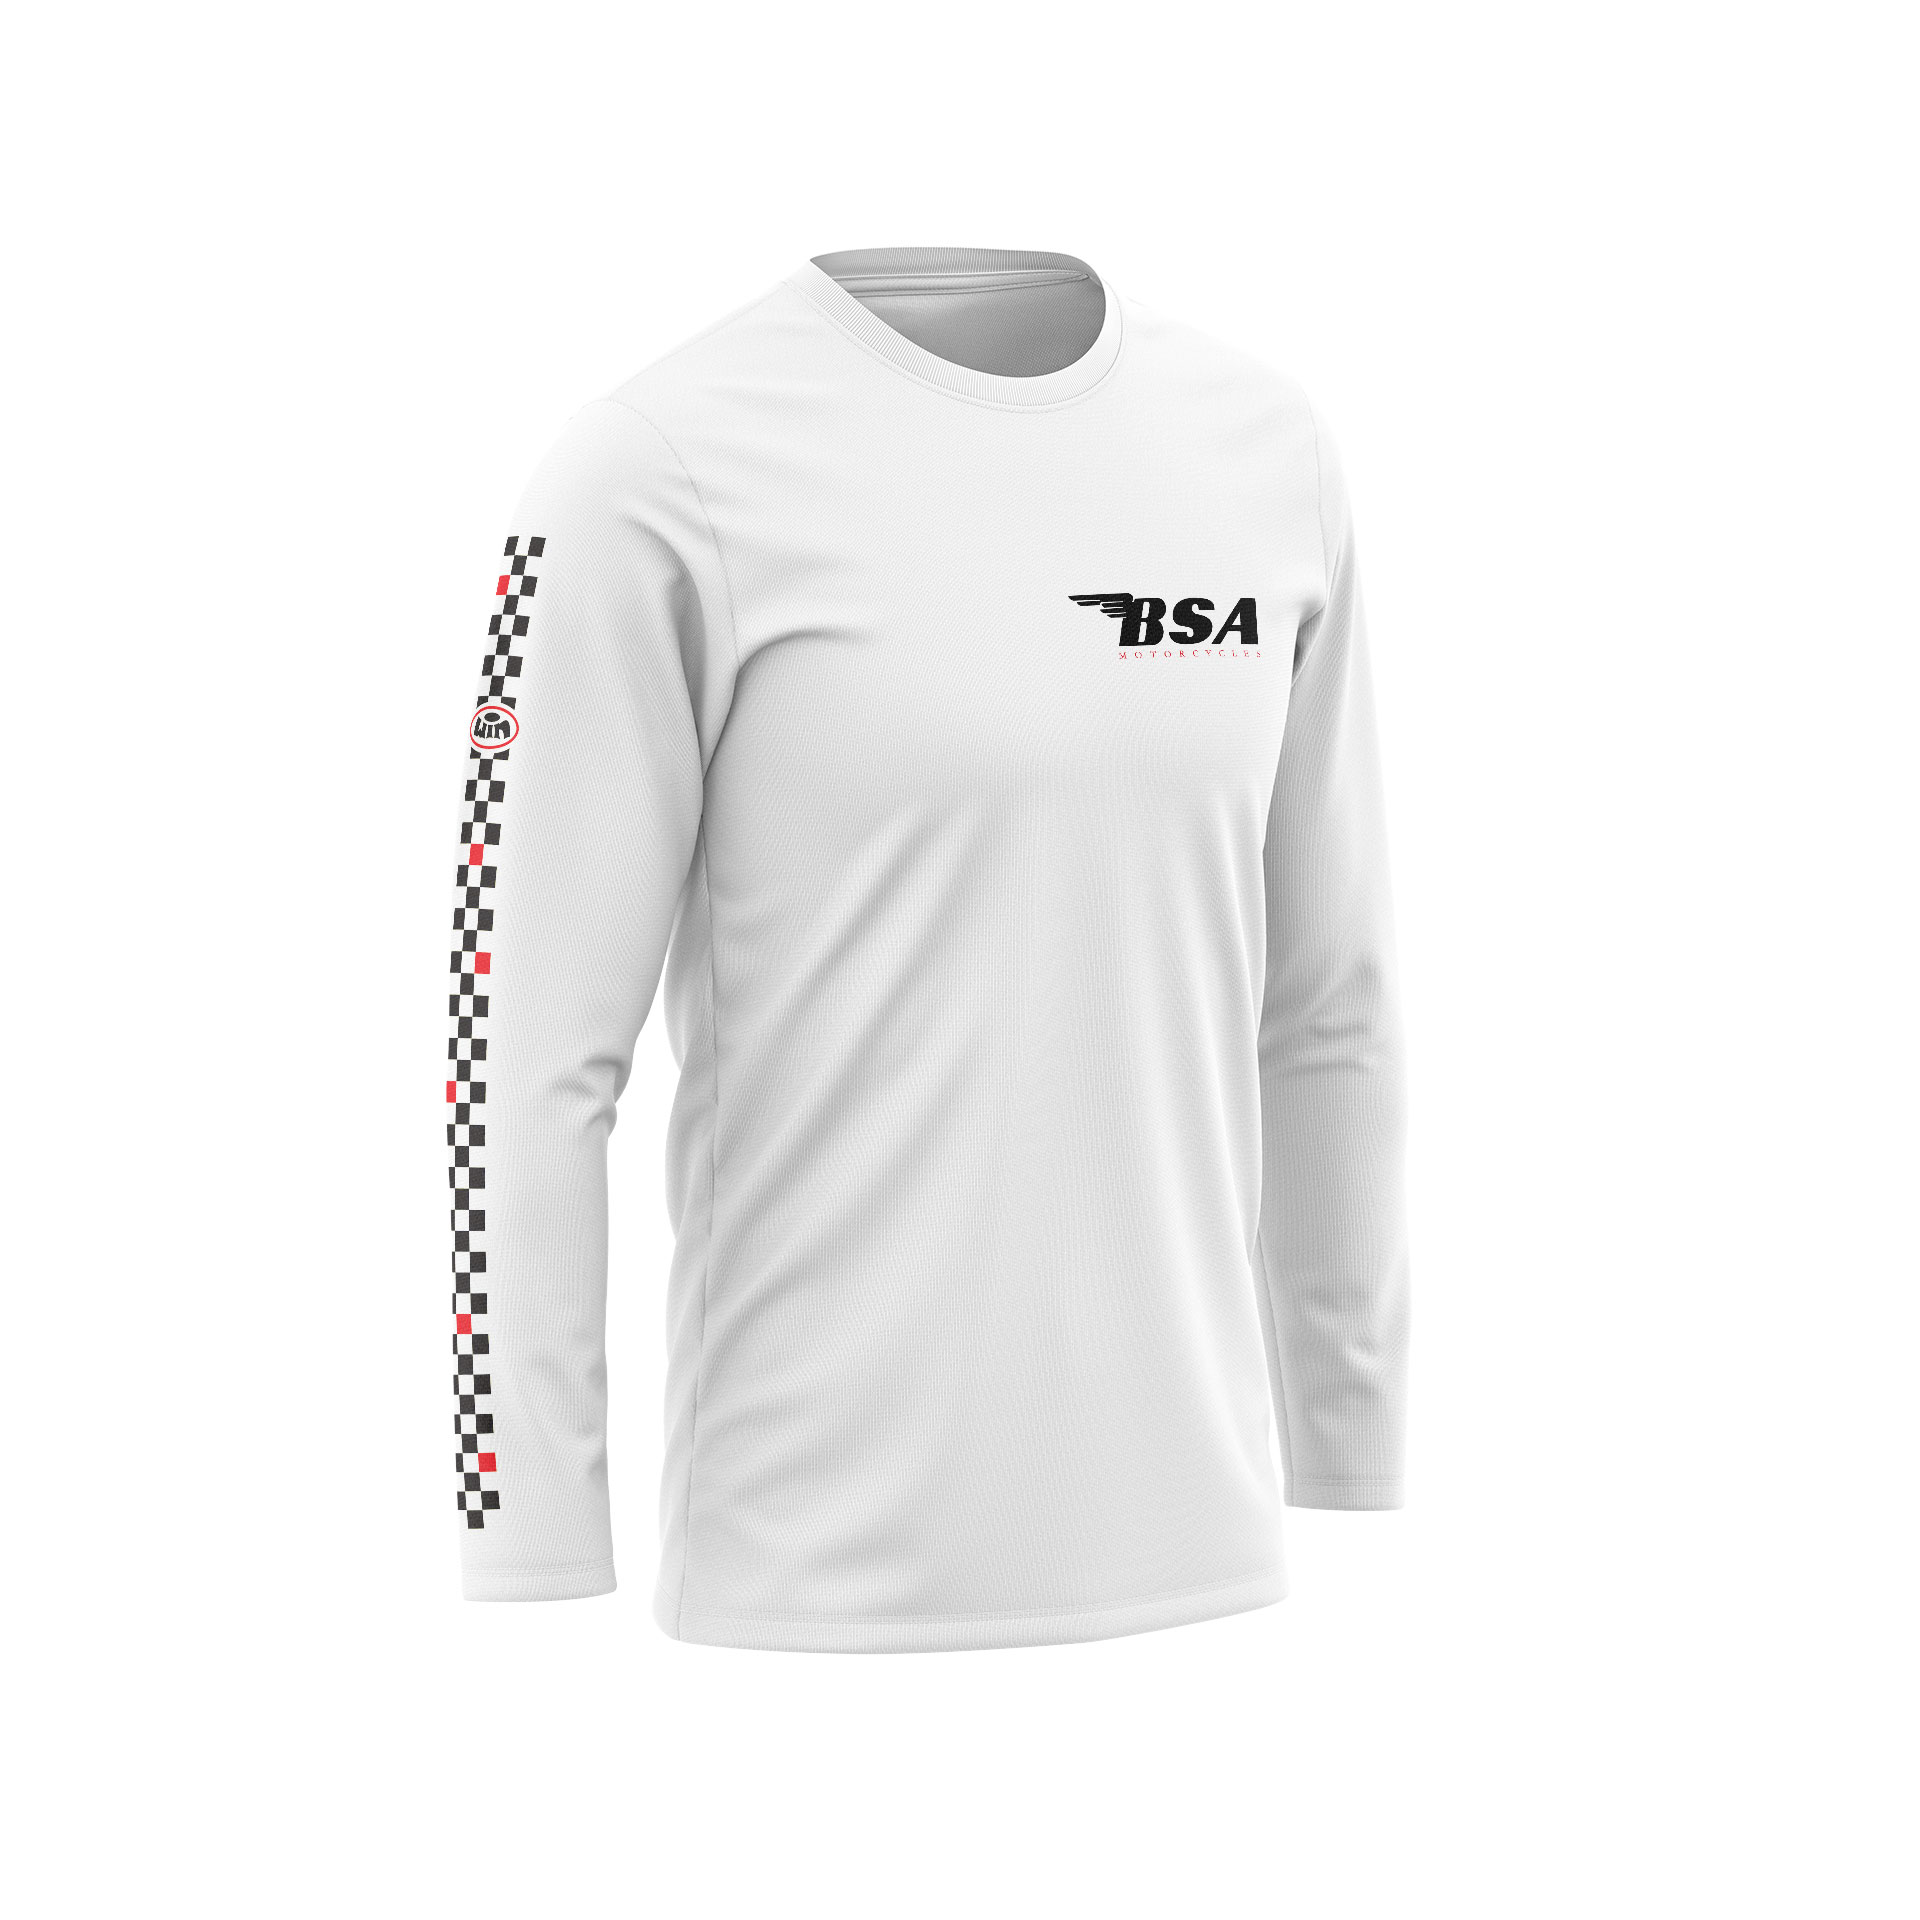 TSDLS BSA Blanc - Noir Rouge